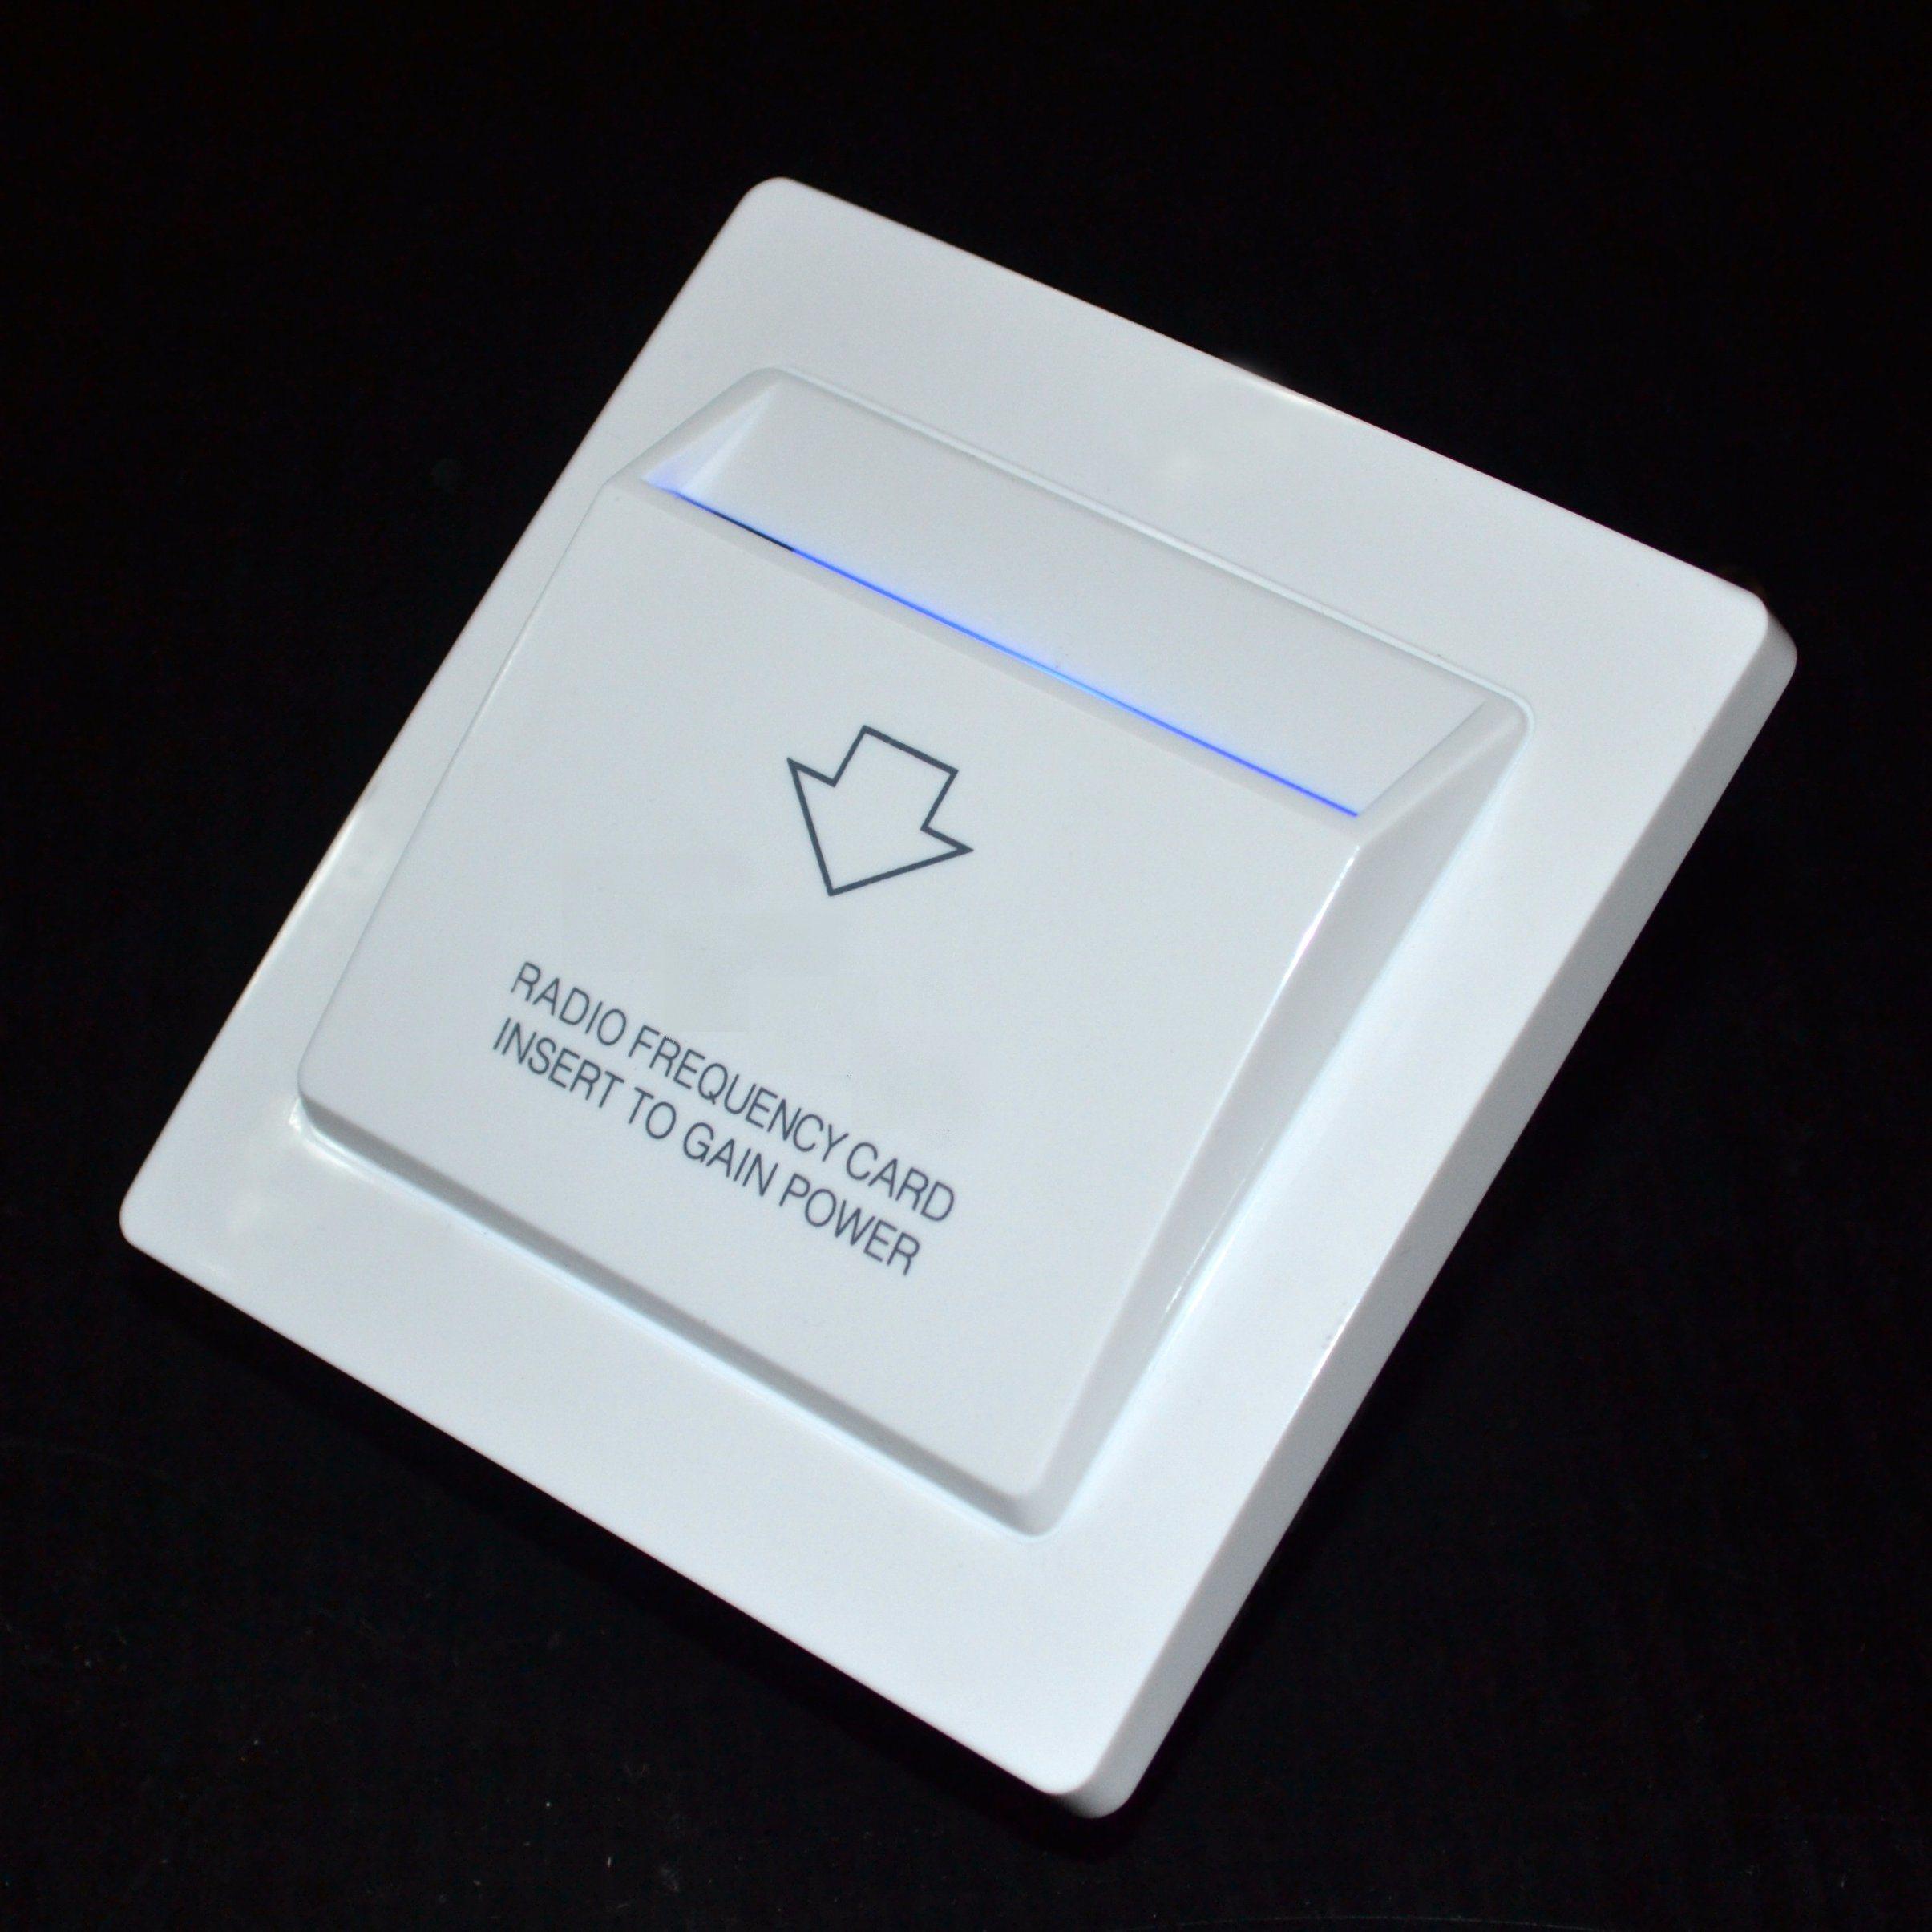 Hotel Energy Saving Switch to Gain Power